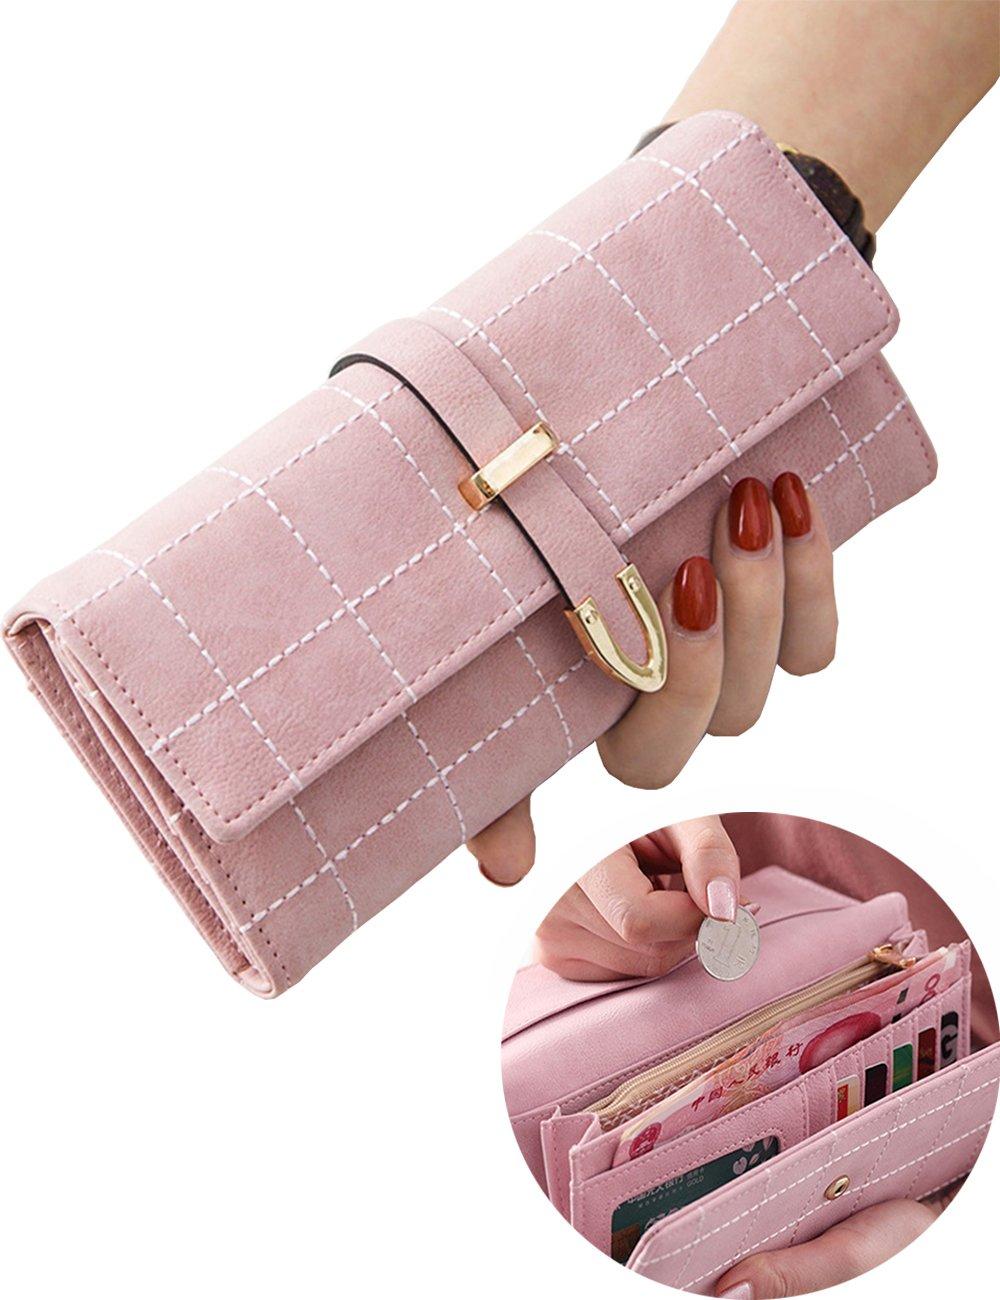 Women Wallet Clutch Grid Long Purse PU Leather Buckle Card Holder Travel Purse (Pink)